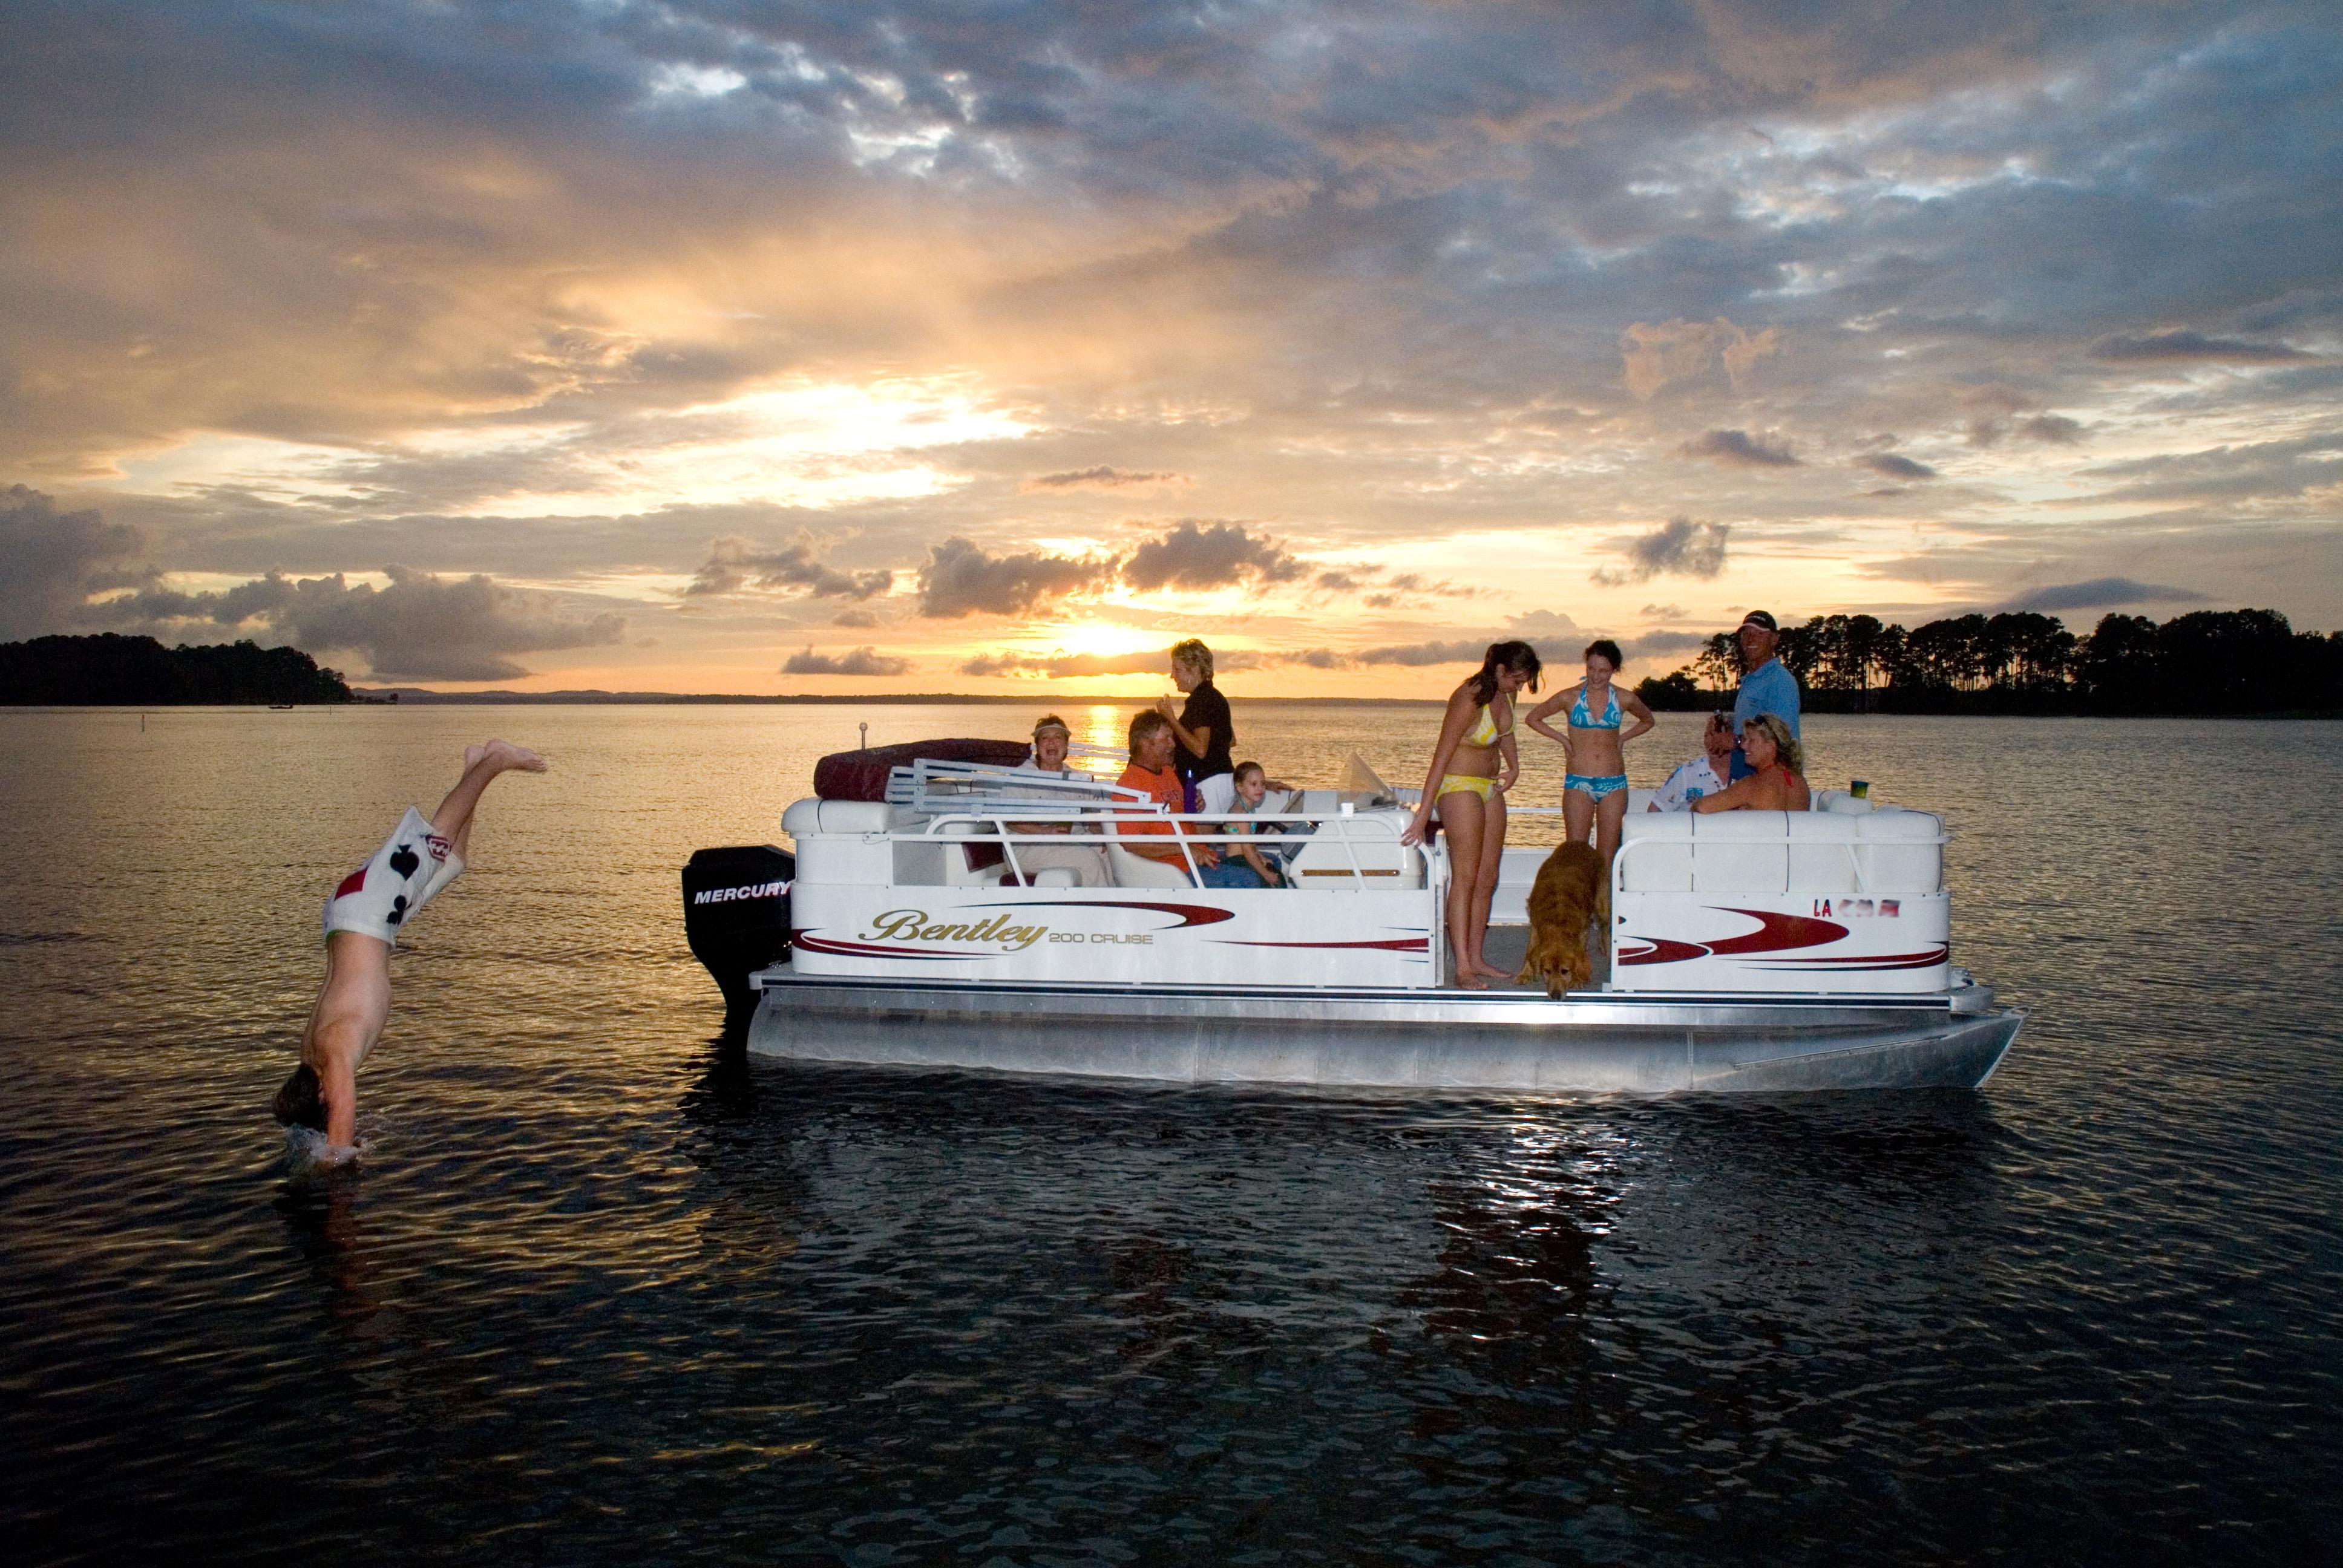 bend toledo rv resort lake cabins louisiana newest sportsmen families boat camping filled planning goodsam